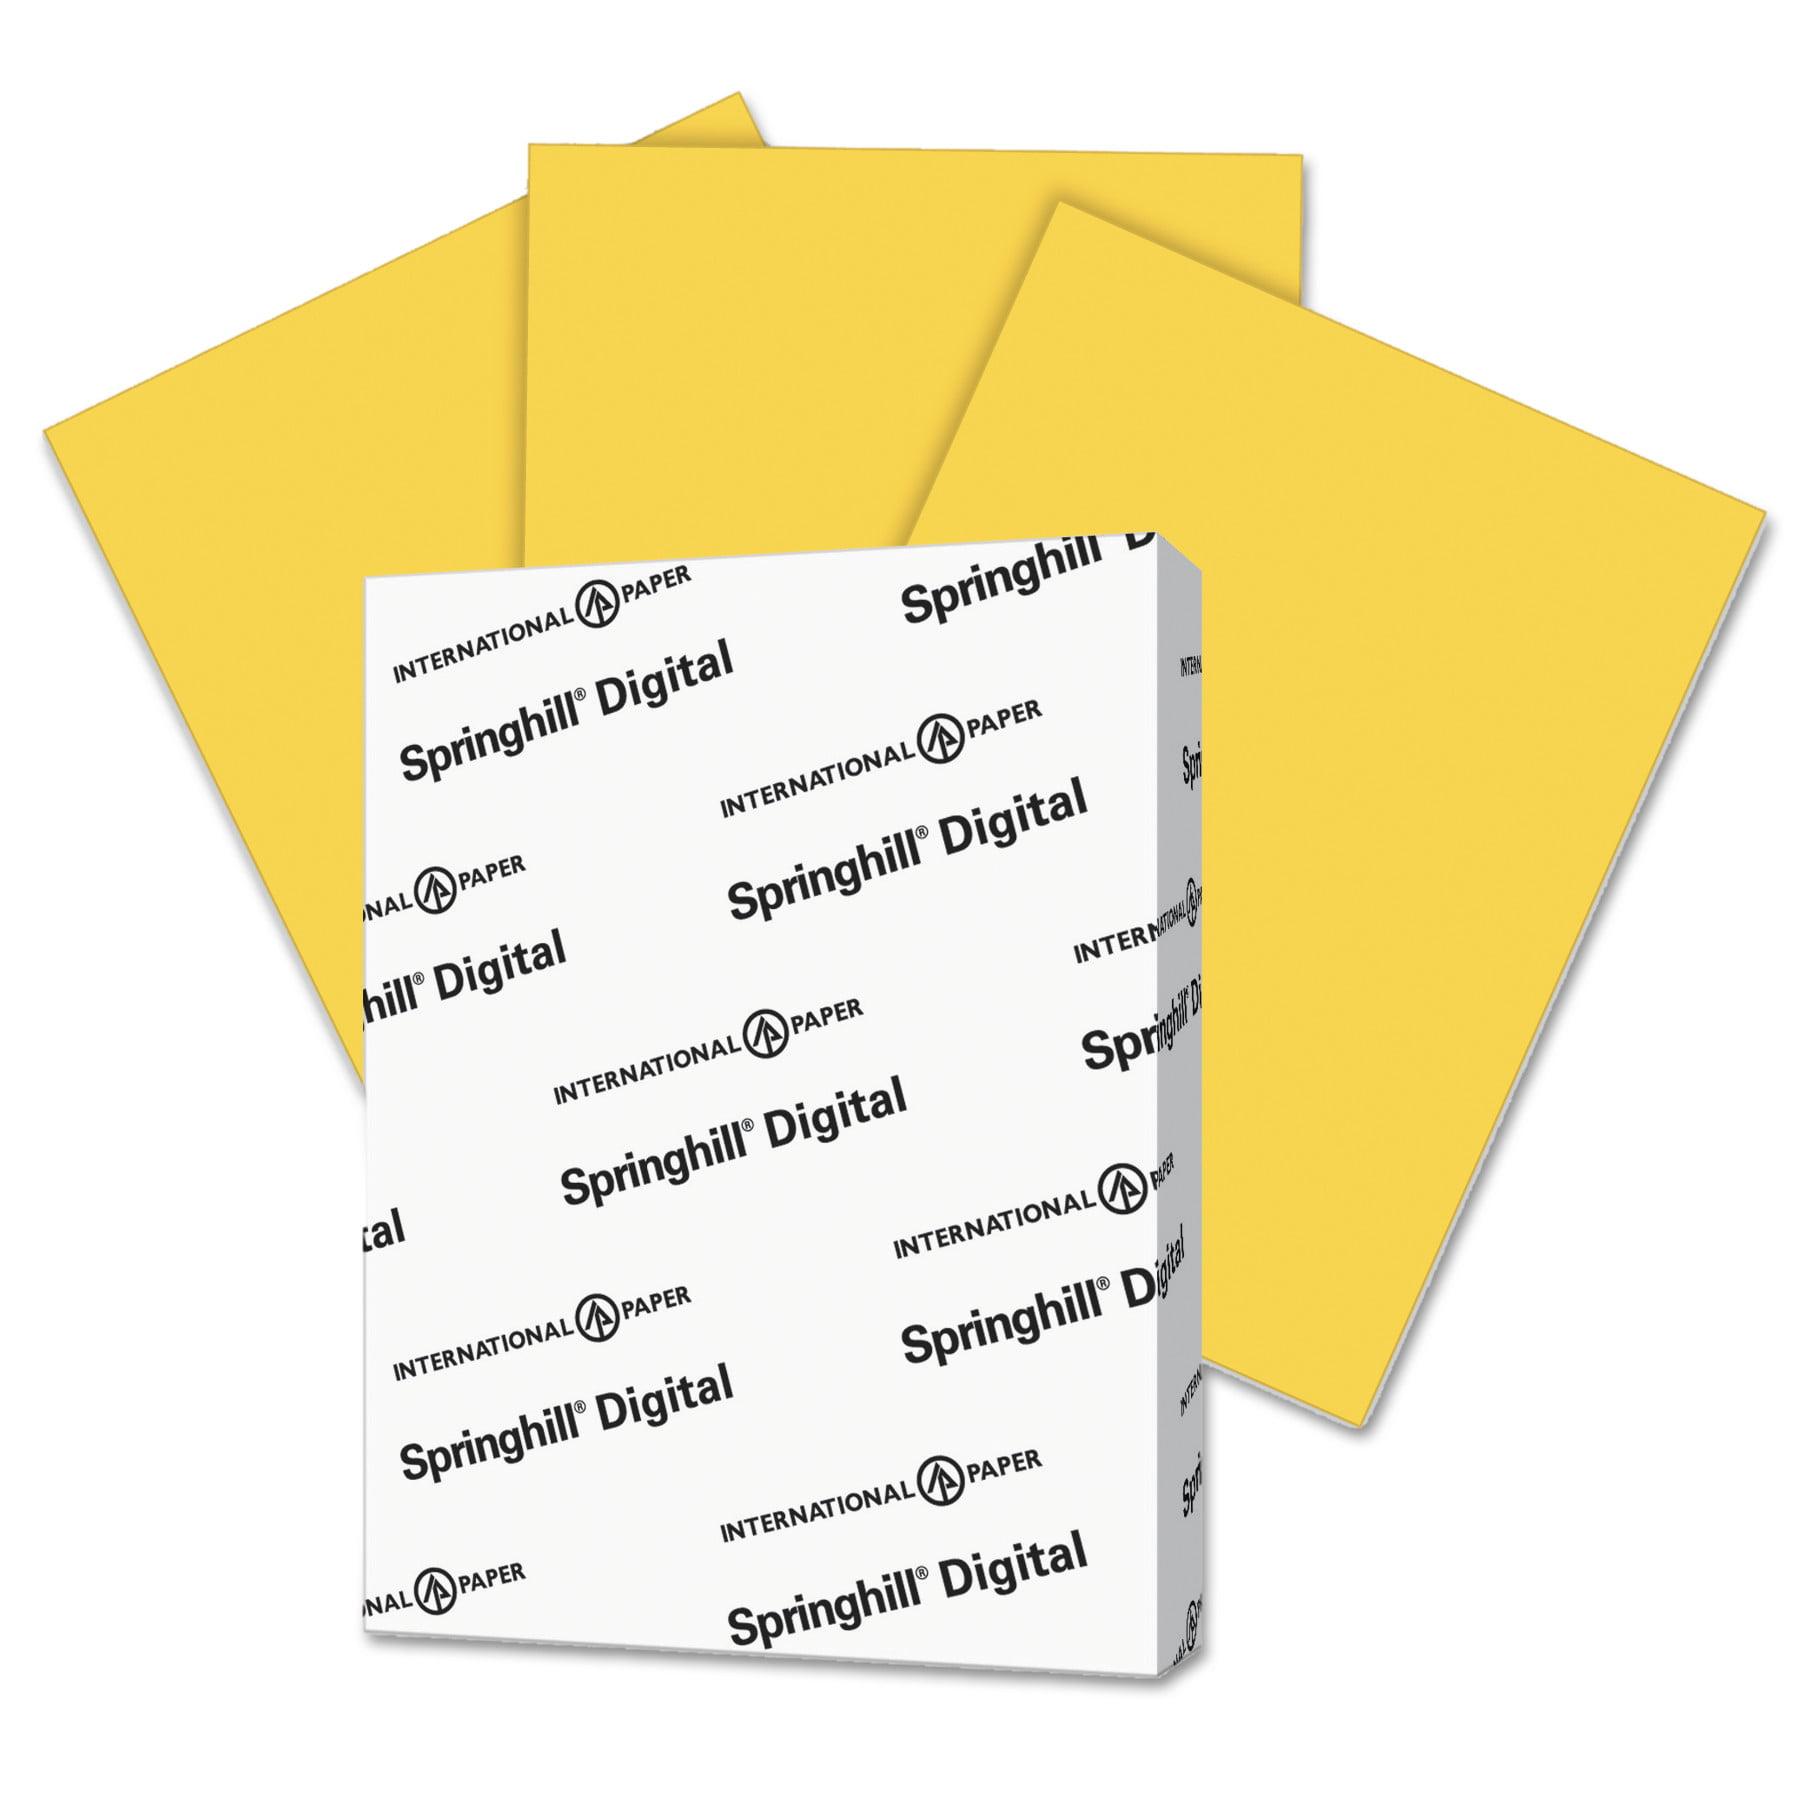 Springhill Digital Vellum Bristol Color Cover, 67 lb, 8 1/2 x 11, Goldenrod, 250 Sheets/Pk -SGH086008